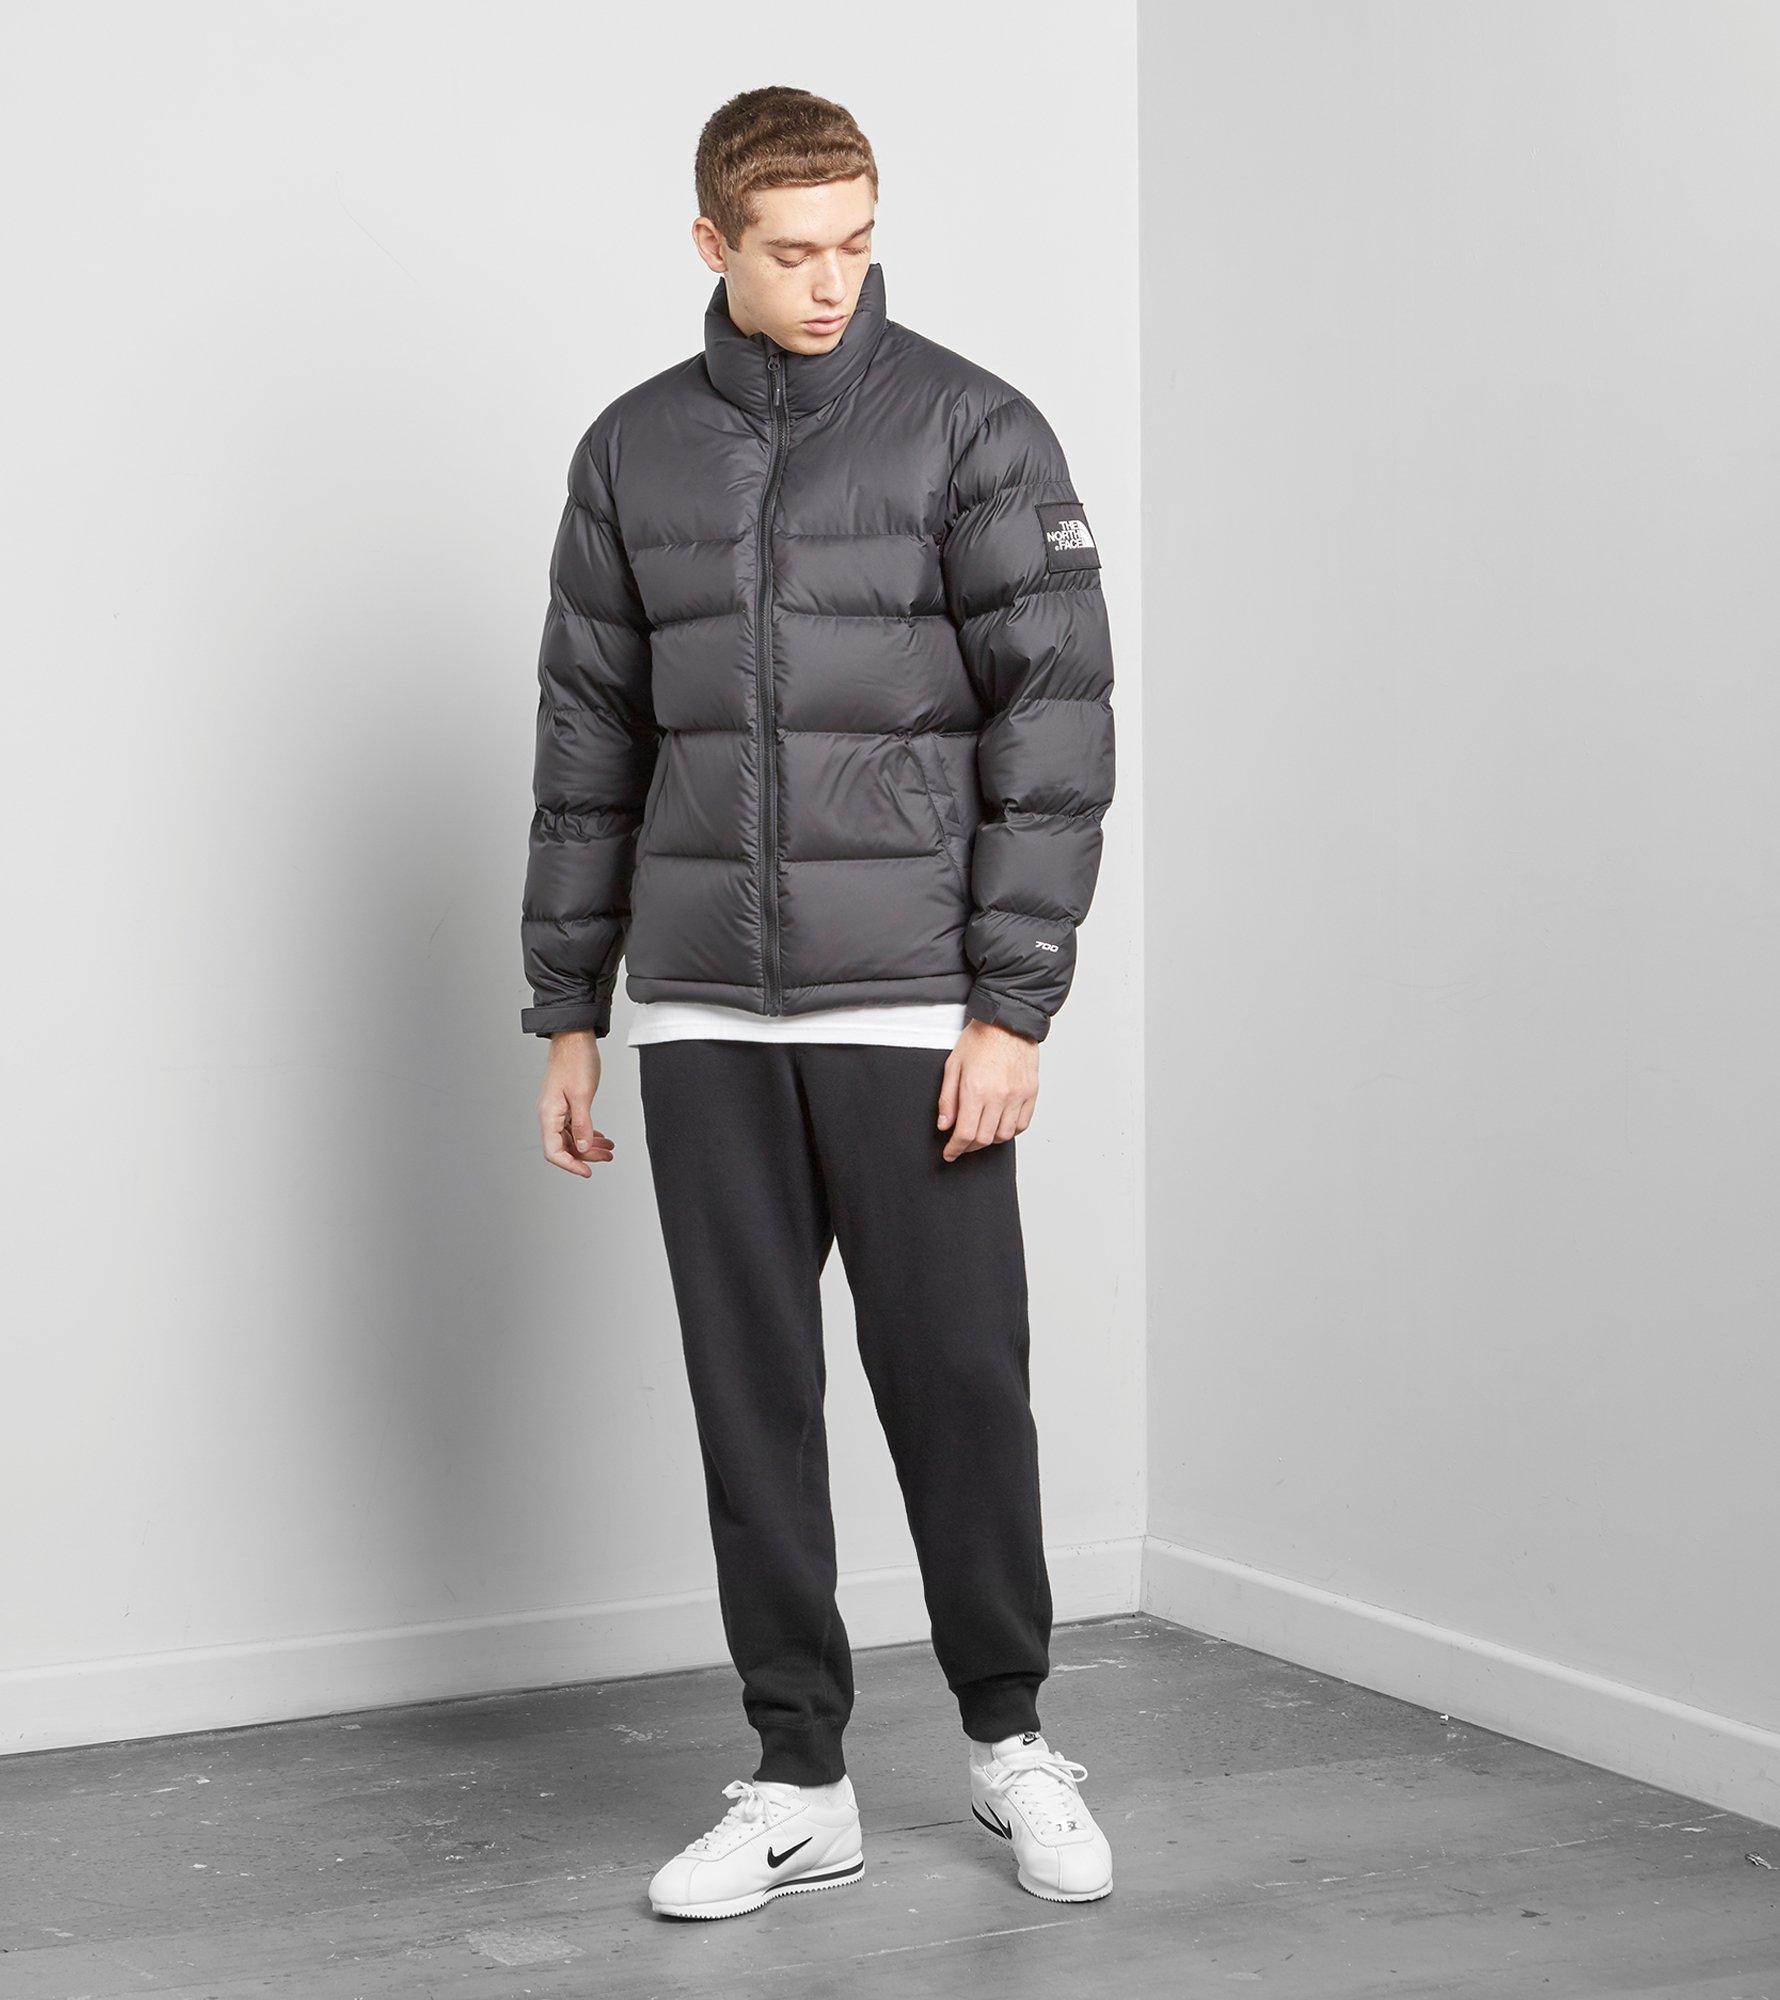 9c915bdda The North Face Black 1992 Nuptse Jacket for men